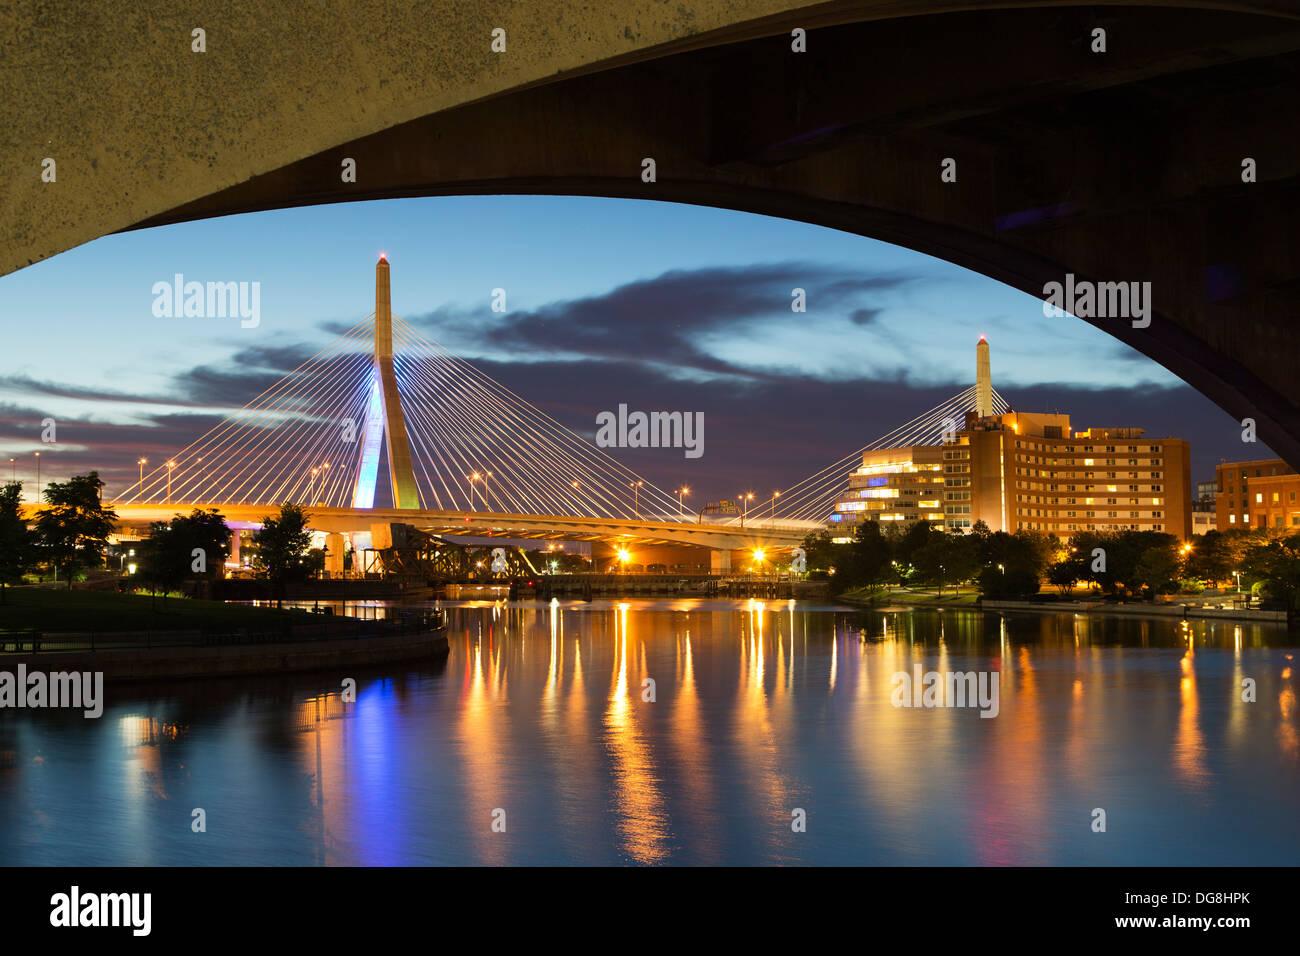 Leonard P. Zakim Bunker Hill Memorial Bridge (Ponte Zakim) e Charles River, Boston, Massachusetts, STATI UNITI D'AMERICA Immagini Stock